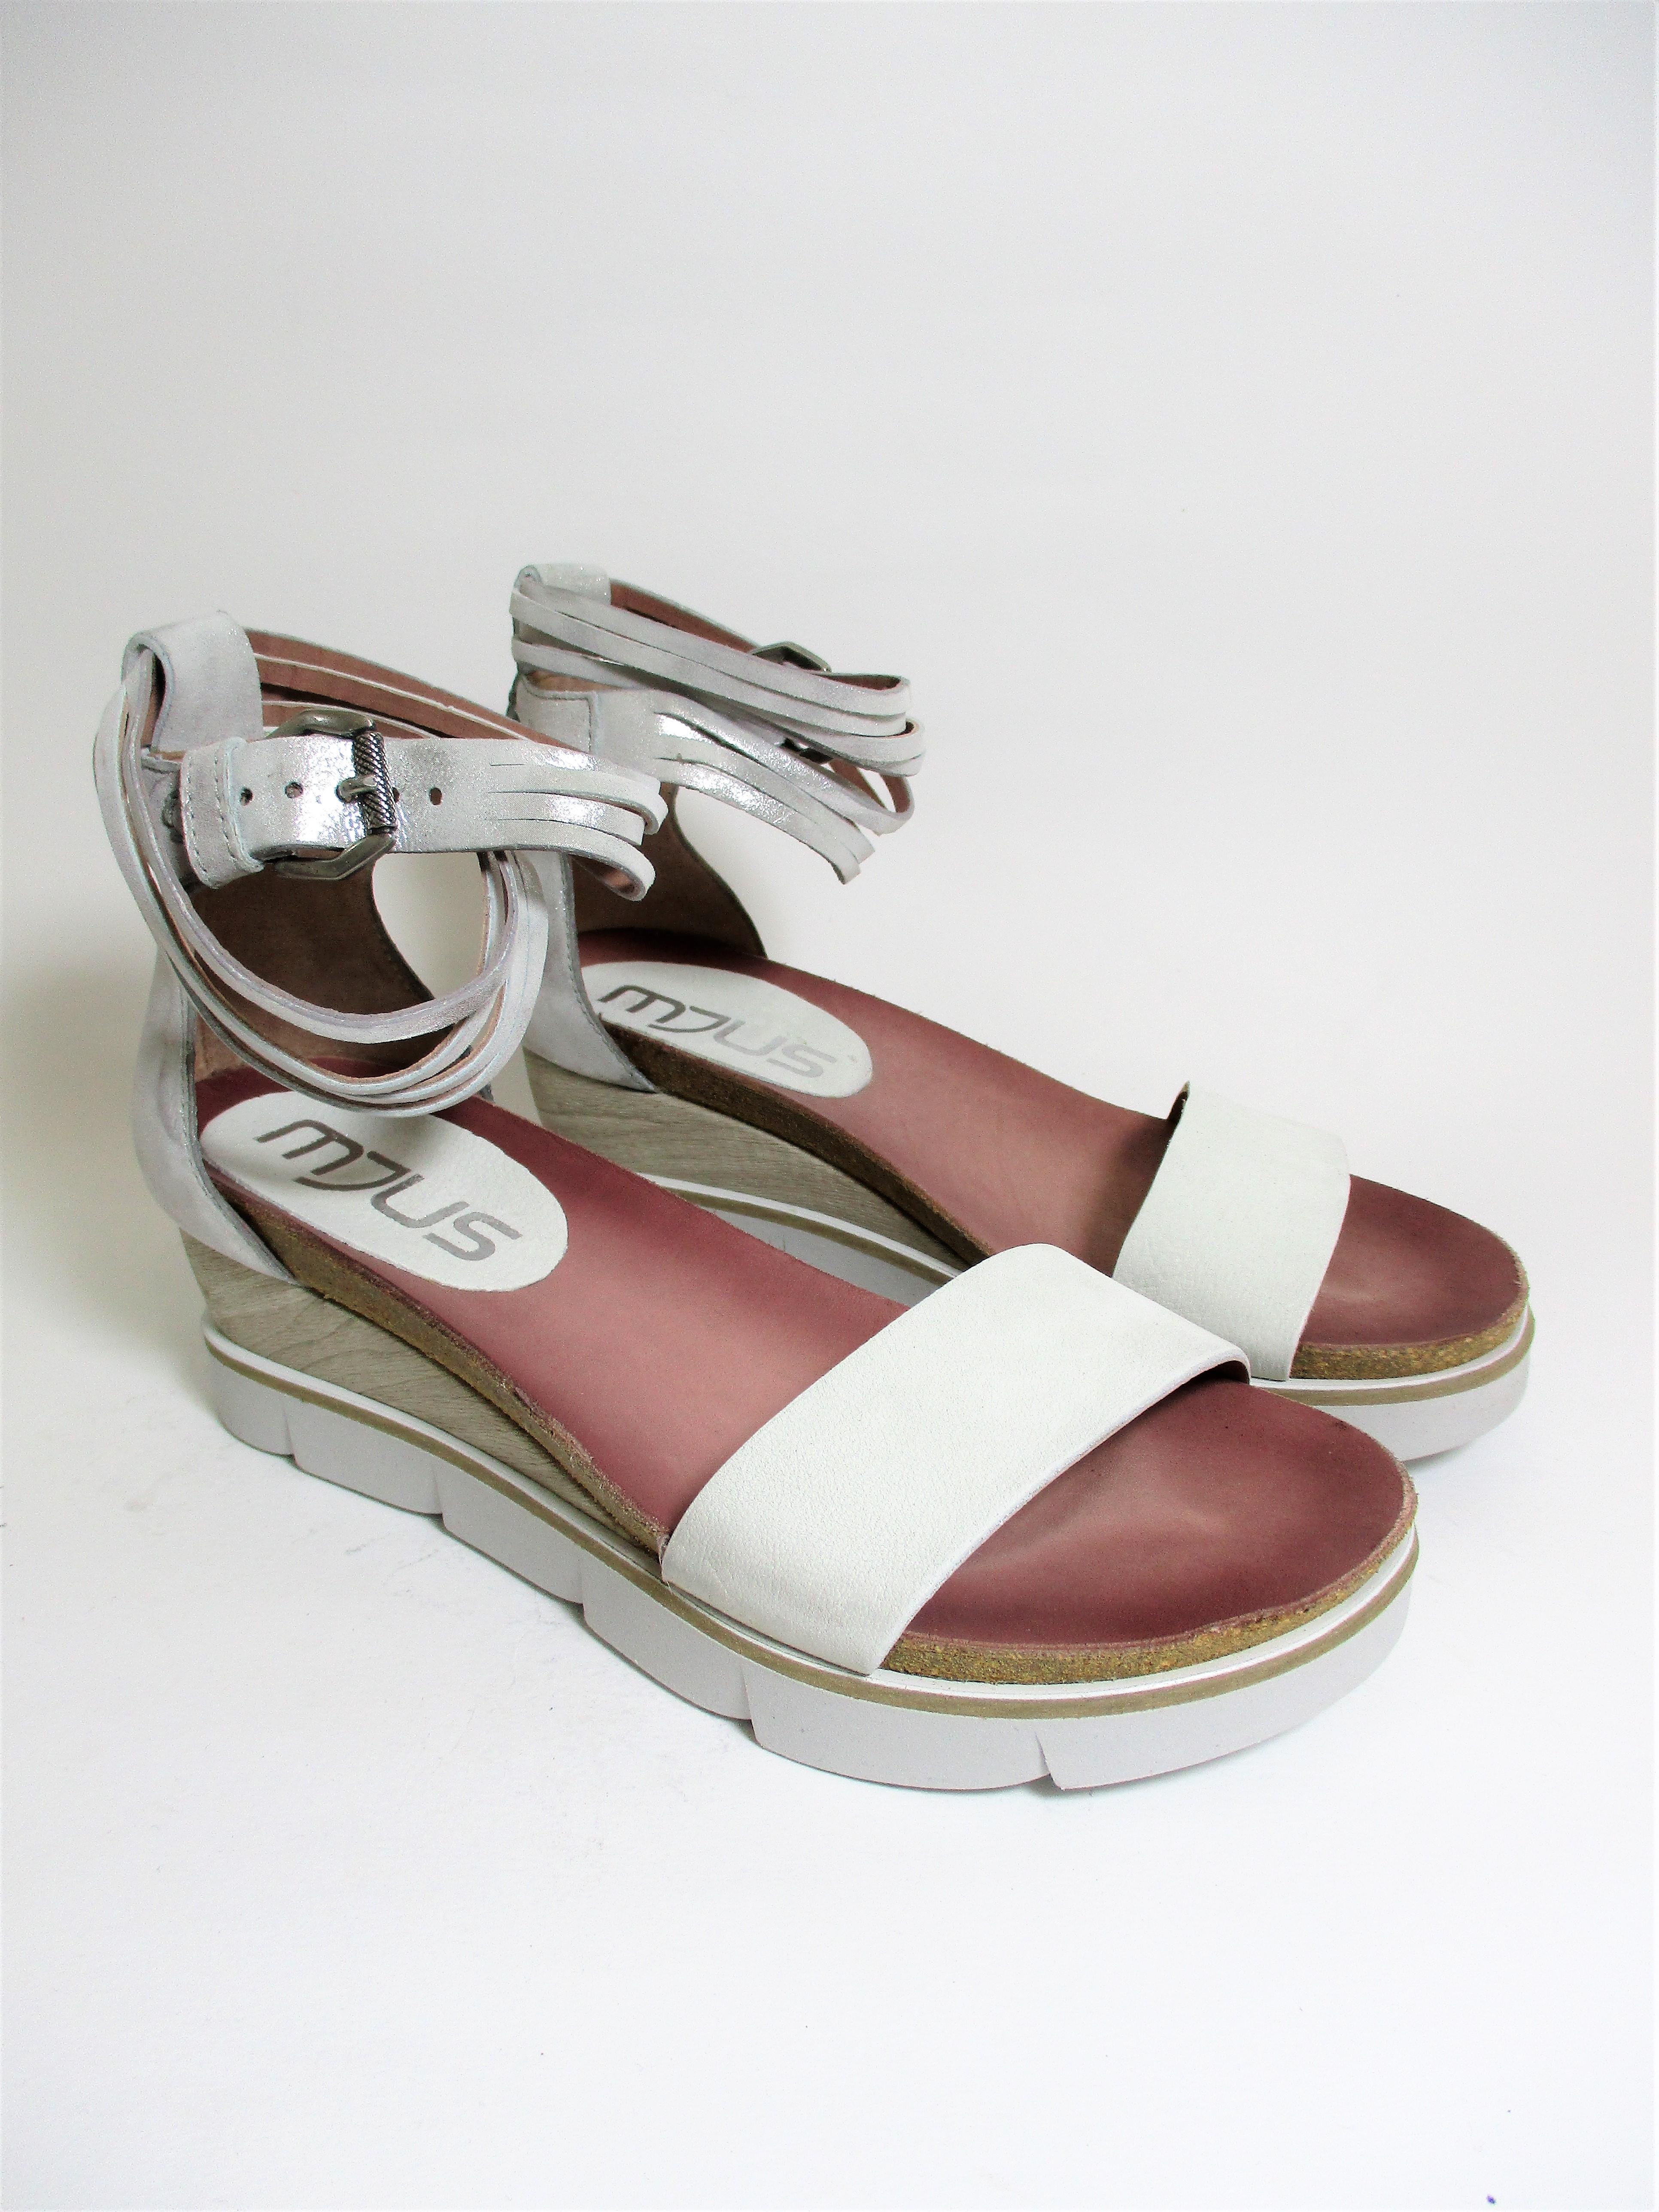 Mujer Calzado Cuero De 866005 Plateado Blanco Valery Sandalia Para Ok8wPn0X